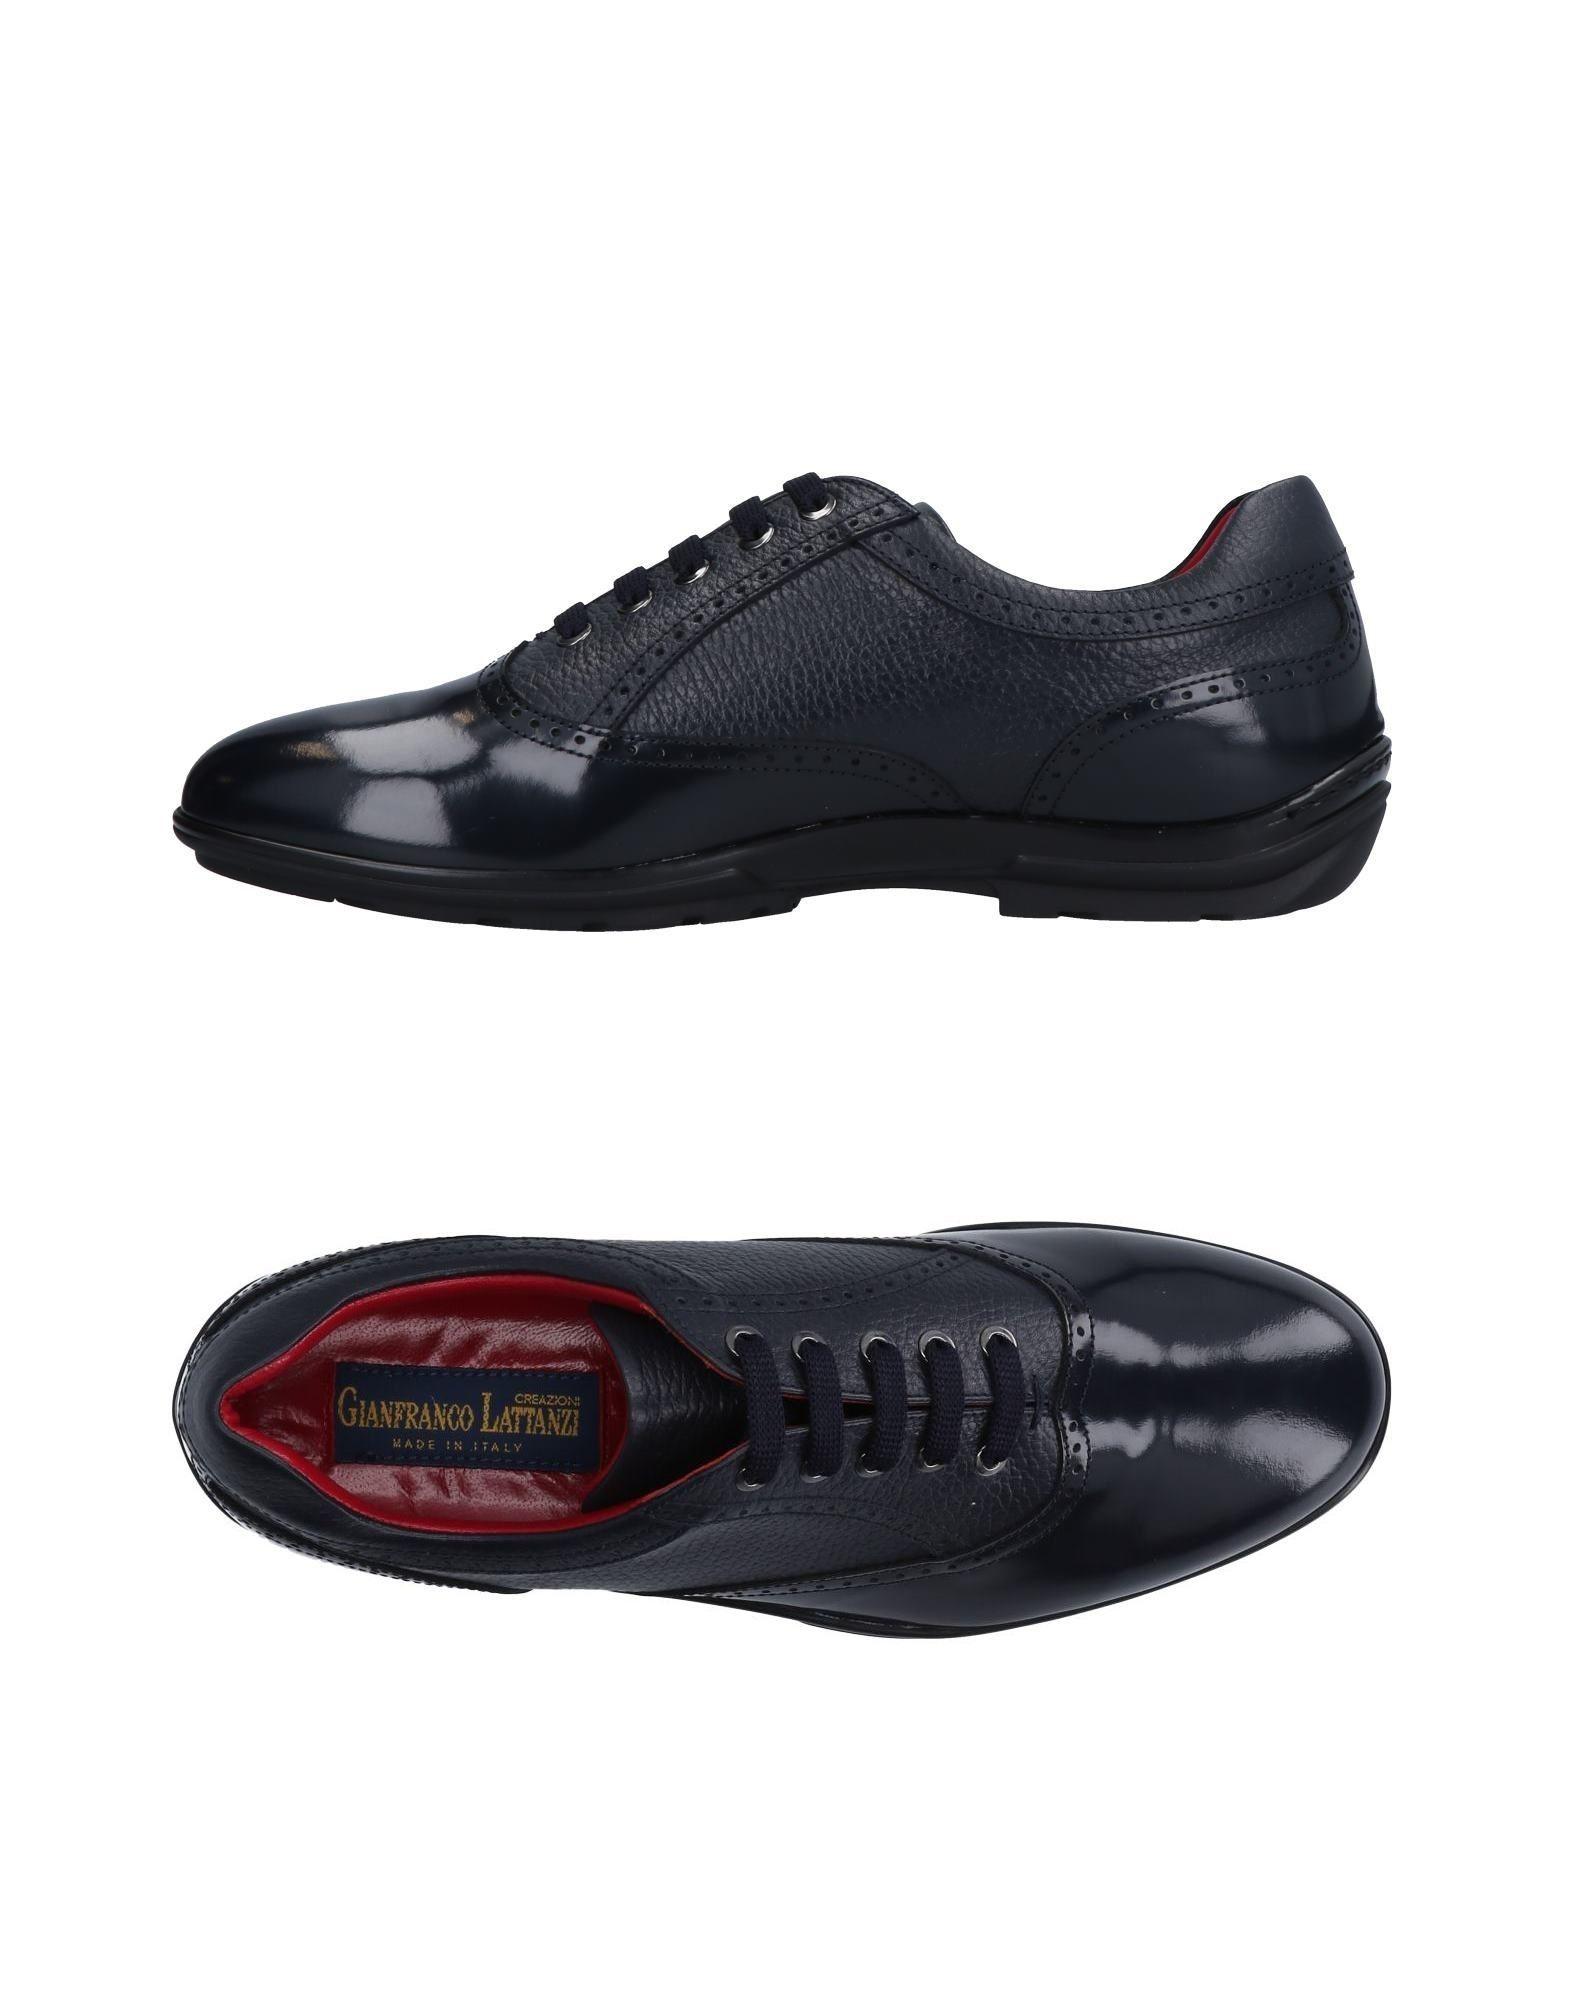 Gianfranco Lattanzi Sneakers Herren  11513164FG Gute Qualität beliebte Schuhe